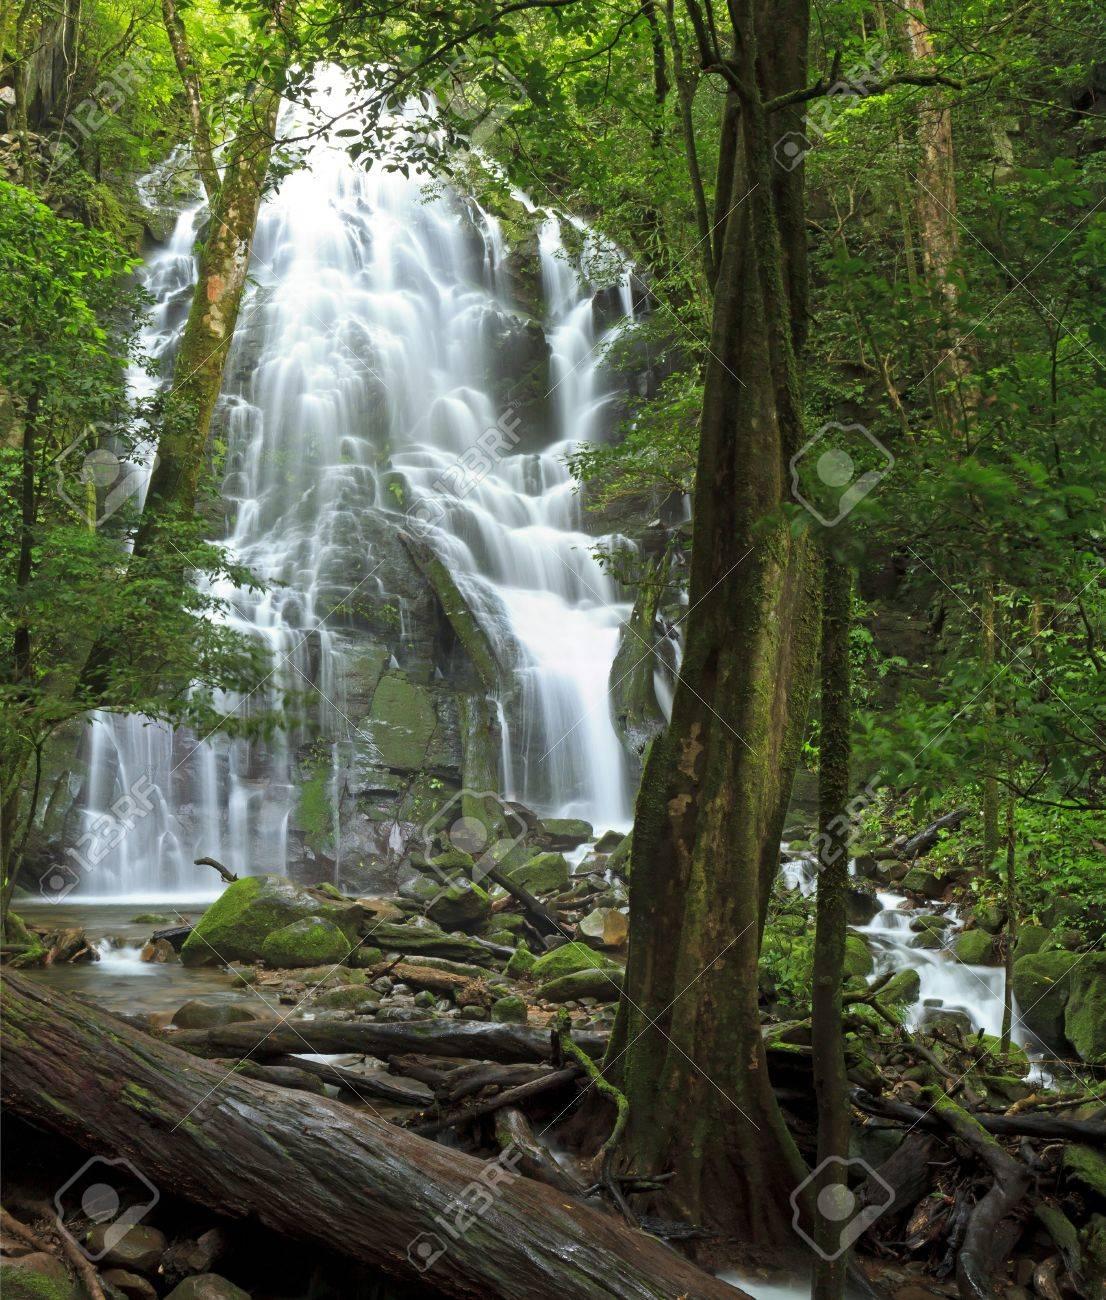 Seasonal waterfall seen through the forest at Rincn de la Vieja National Park - 14126581